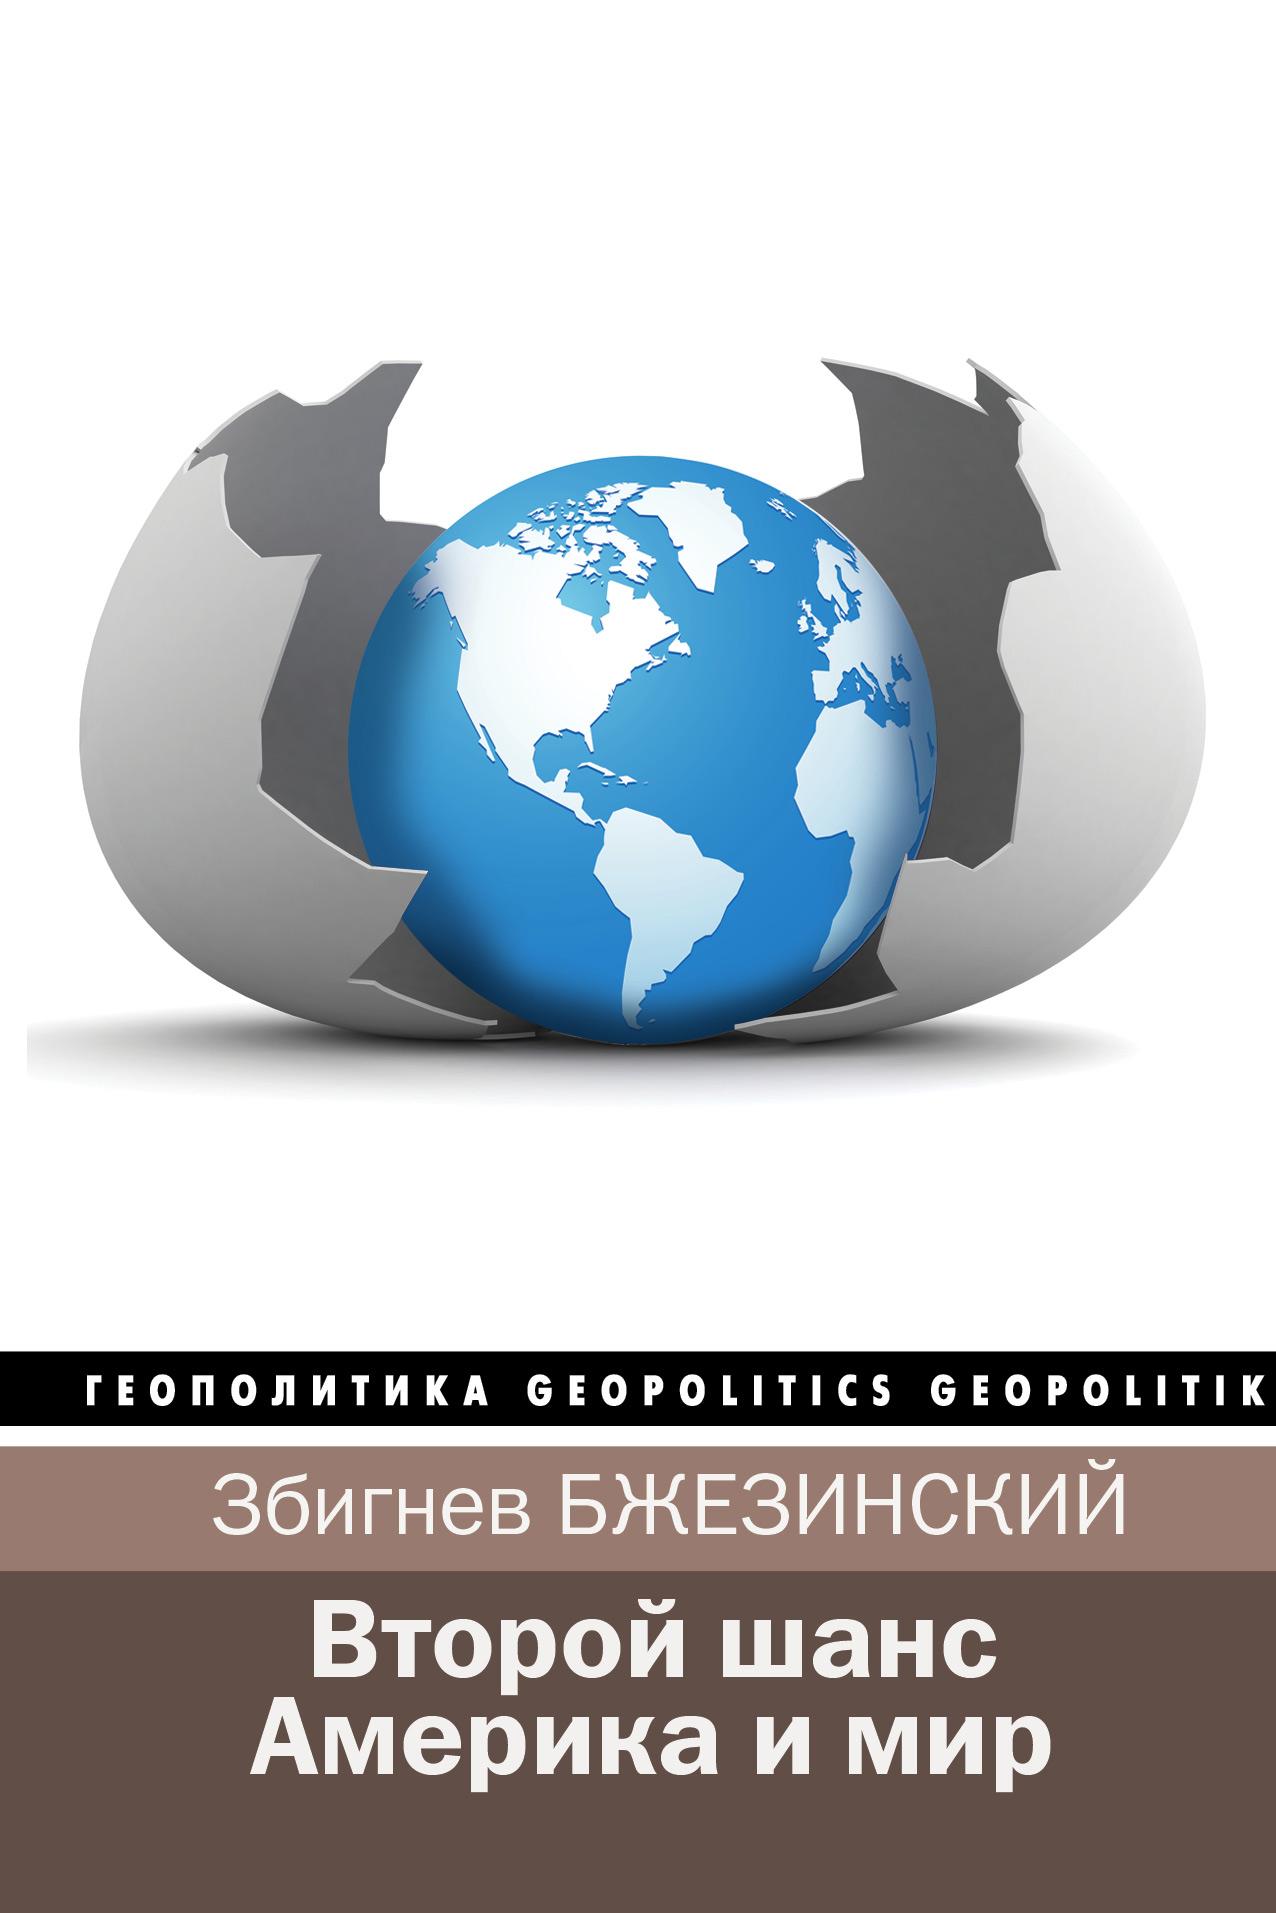 Збигнев Бжезинский Второй шанс. Америка и мир (сборник) бжезинский з скоукрофт б второй шанс америка и мир isbn 9785179826408